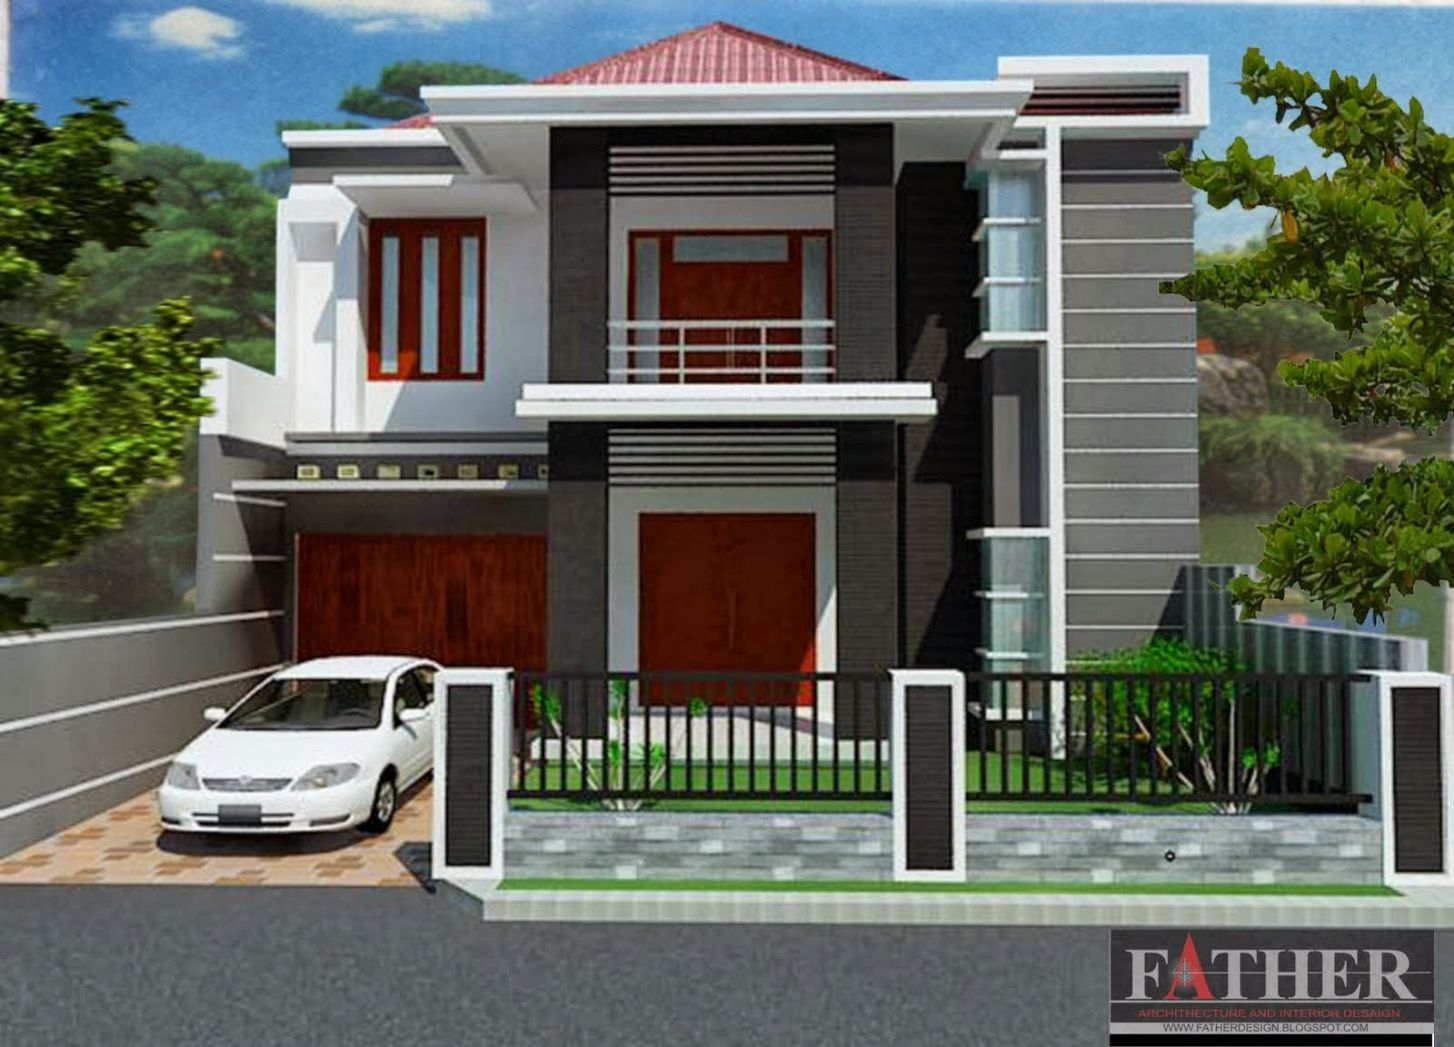 Charming Home Design Type 70 Part - 7: Rumah Minimalis Sederhana Type 70 Check More At Http://desainrumahkita.net/  · Minimalist House DesignHouse ...